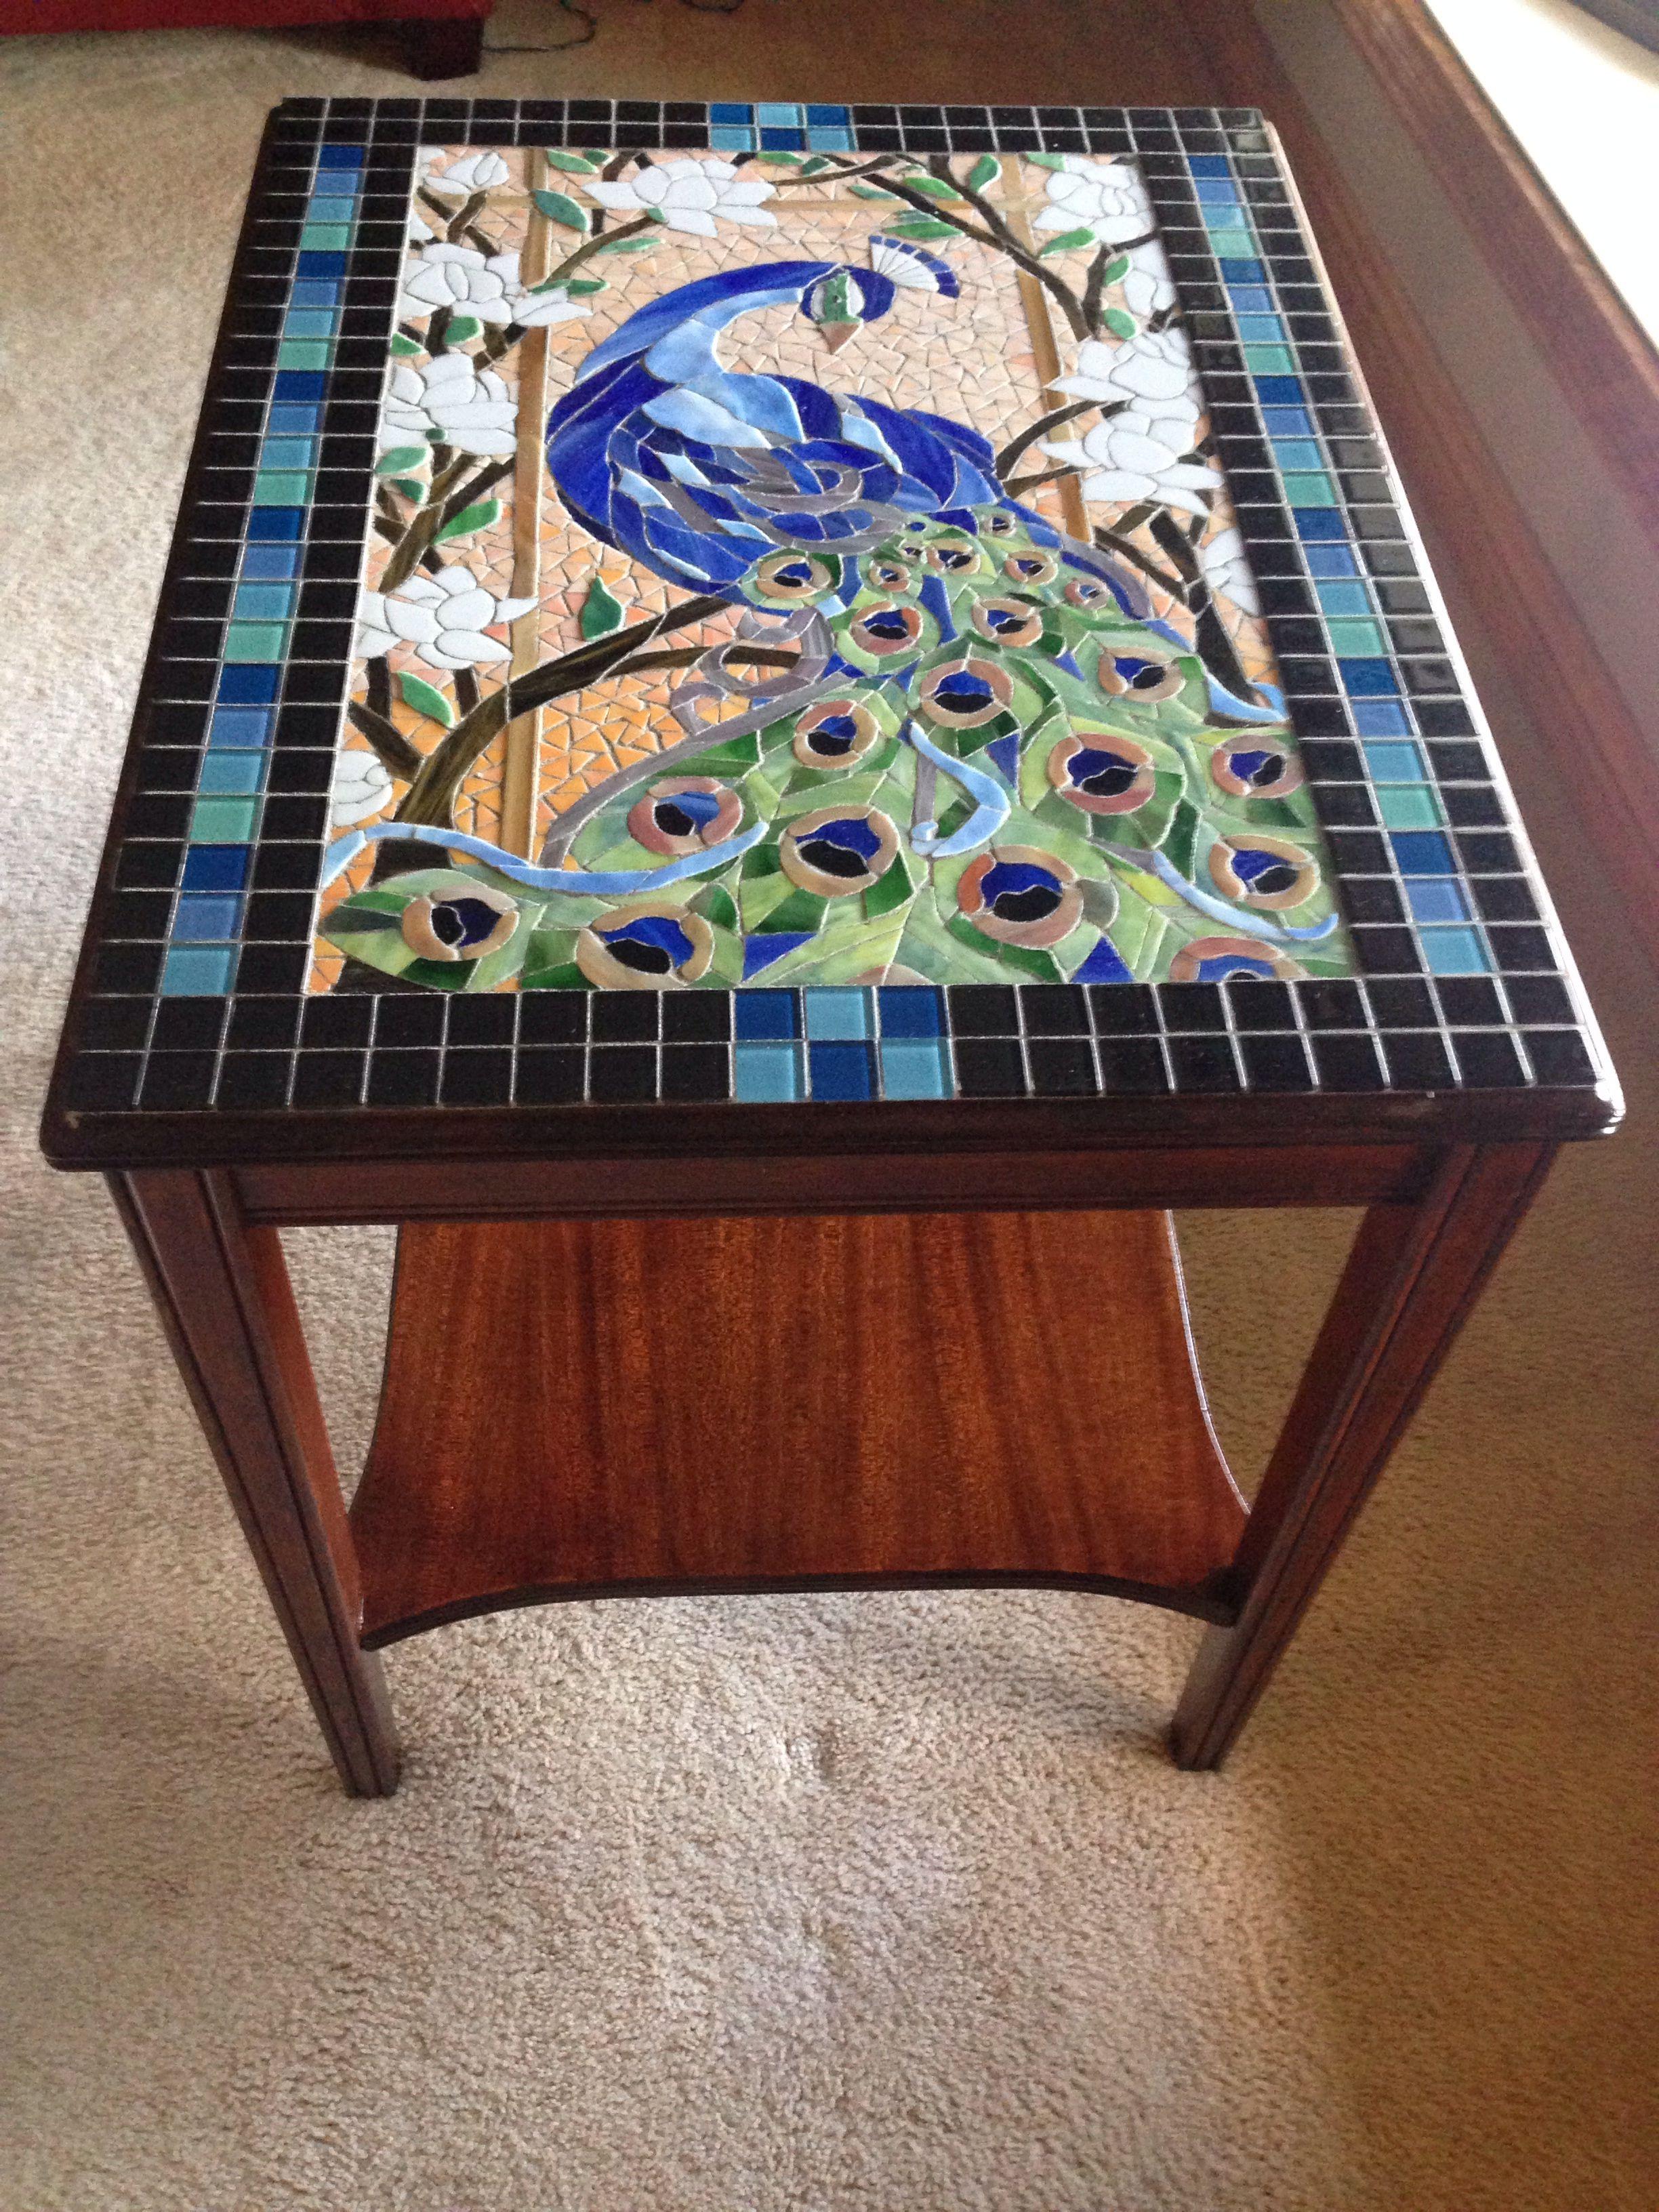 Peacock Stained Glass Mosaic Table by Melissa Czekaj